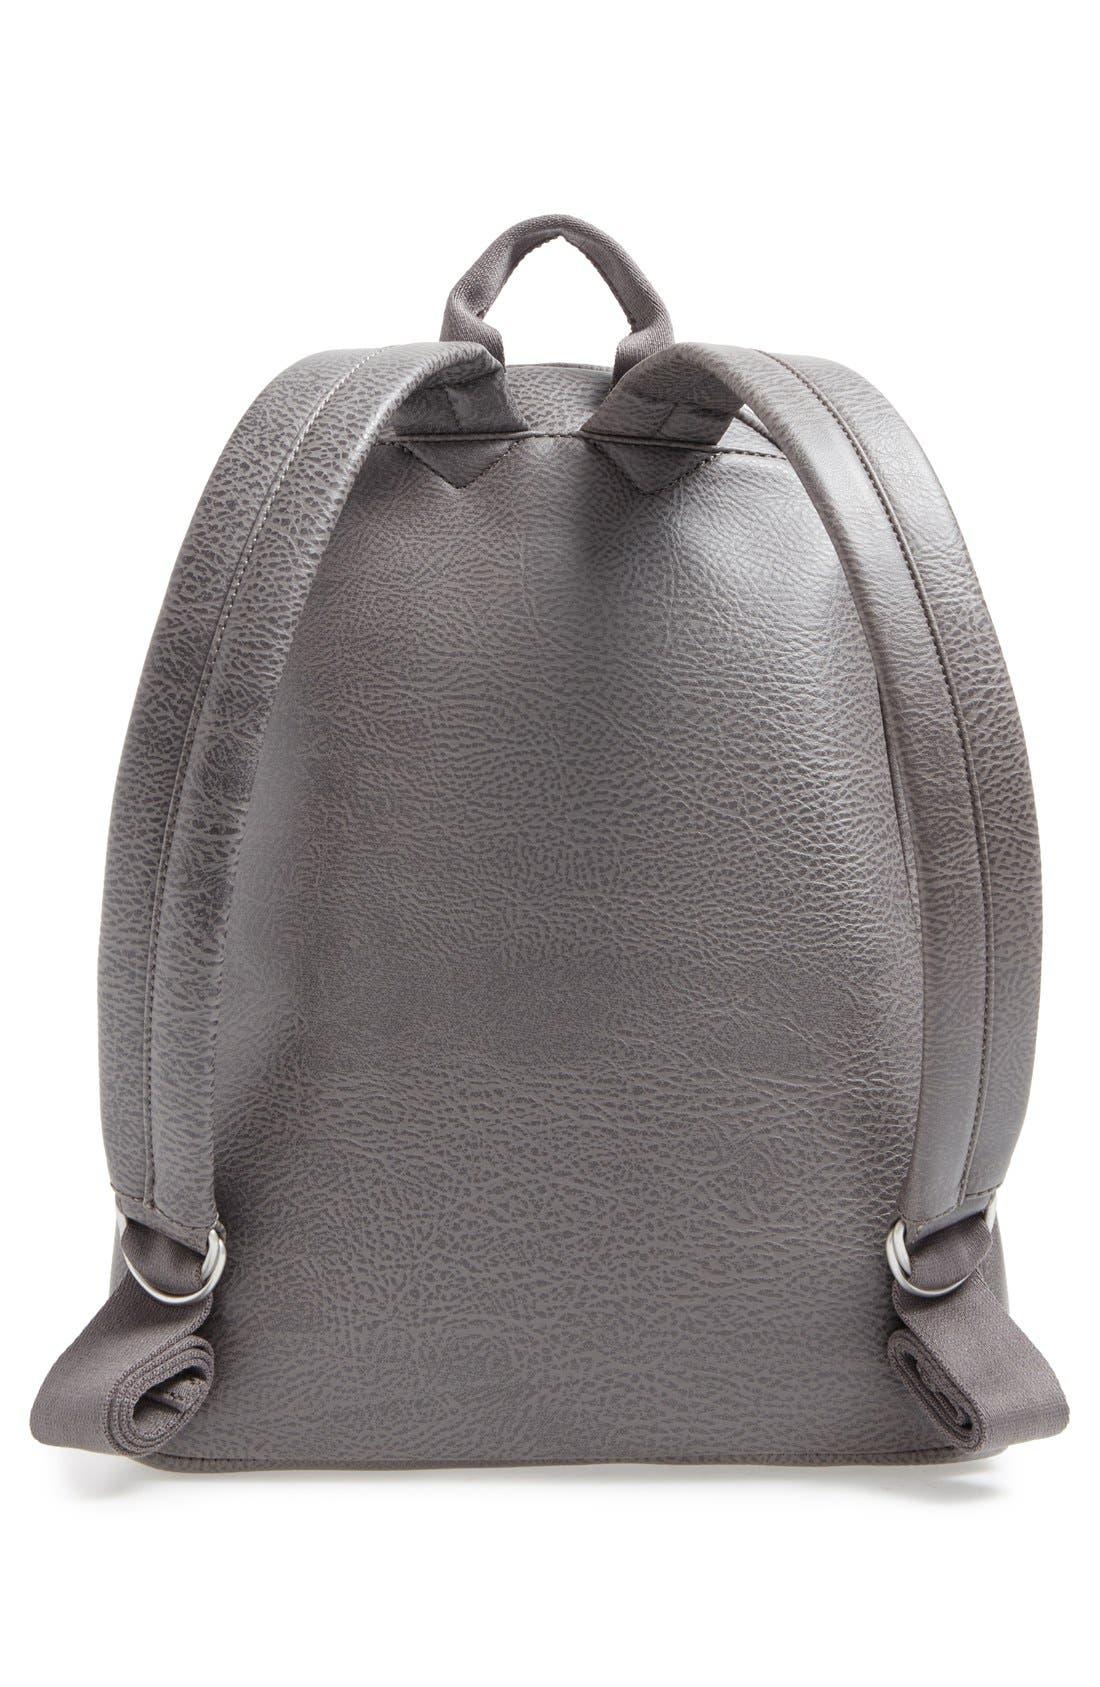 Alternate Image 3  - Matt & Nat 'July' Faux Leather Backpack